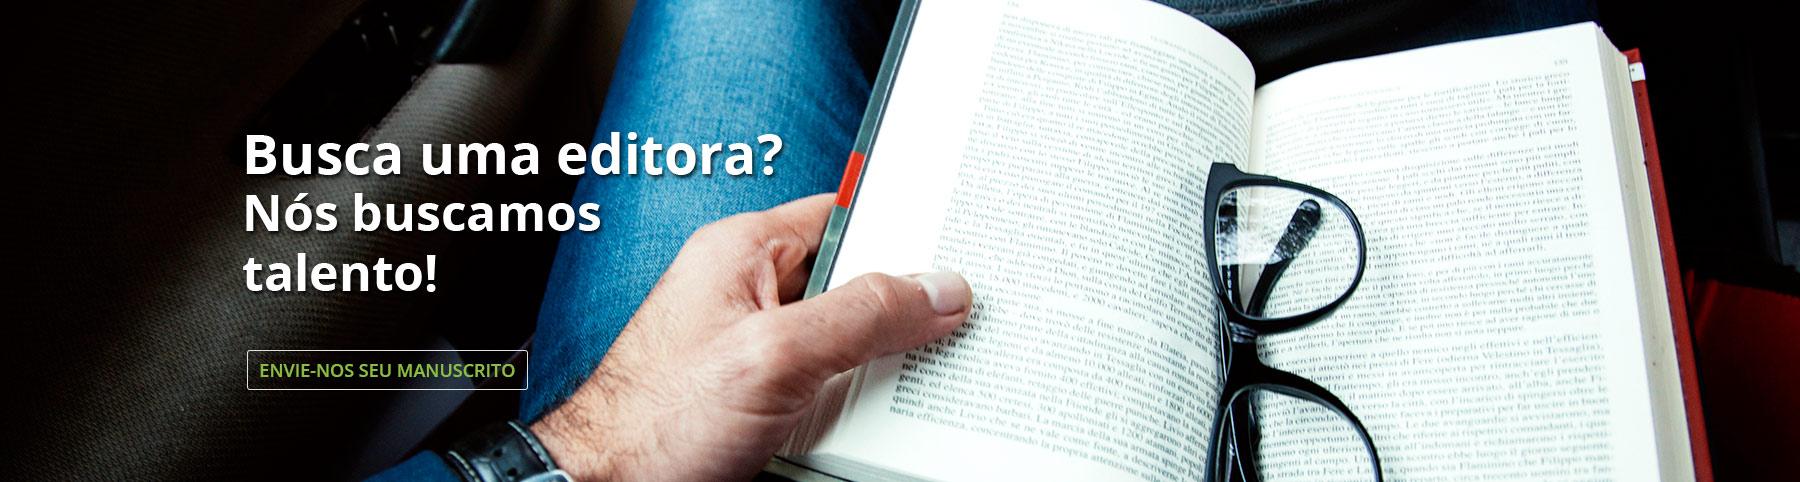 http://www.bubok.com.br/servicios360/formulario_asesor